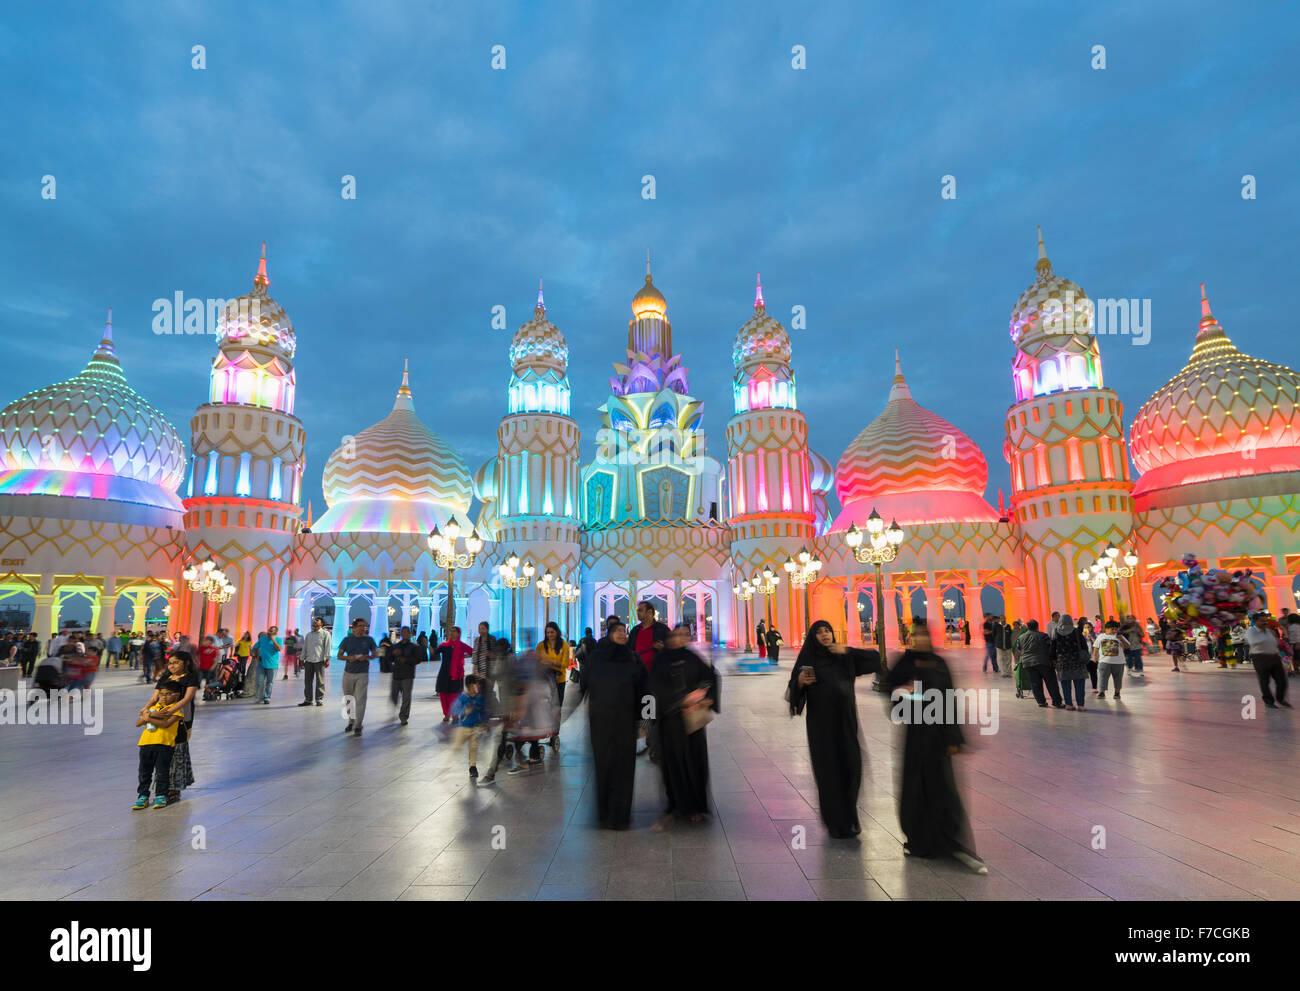 Vista de noche iluminada Puerta del mundo en Aldea Global 2015 en Dubai, Emiratos Árabes Unidos Imagen De Stock